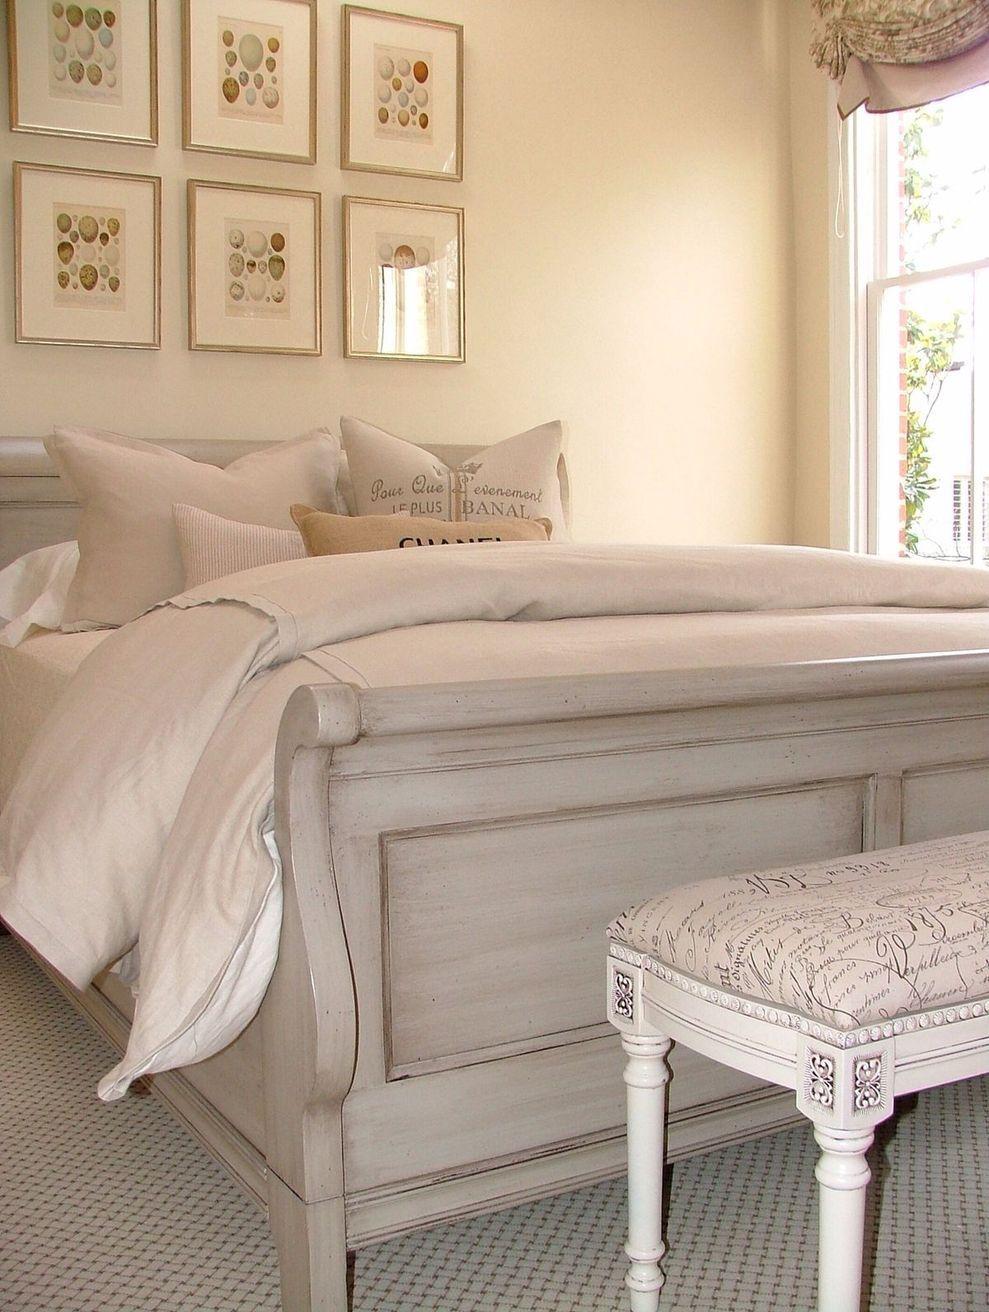 29 Inspiring Diy Bed Frame Ideas To Make Your Bedroom More